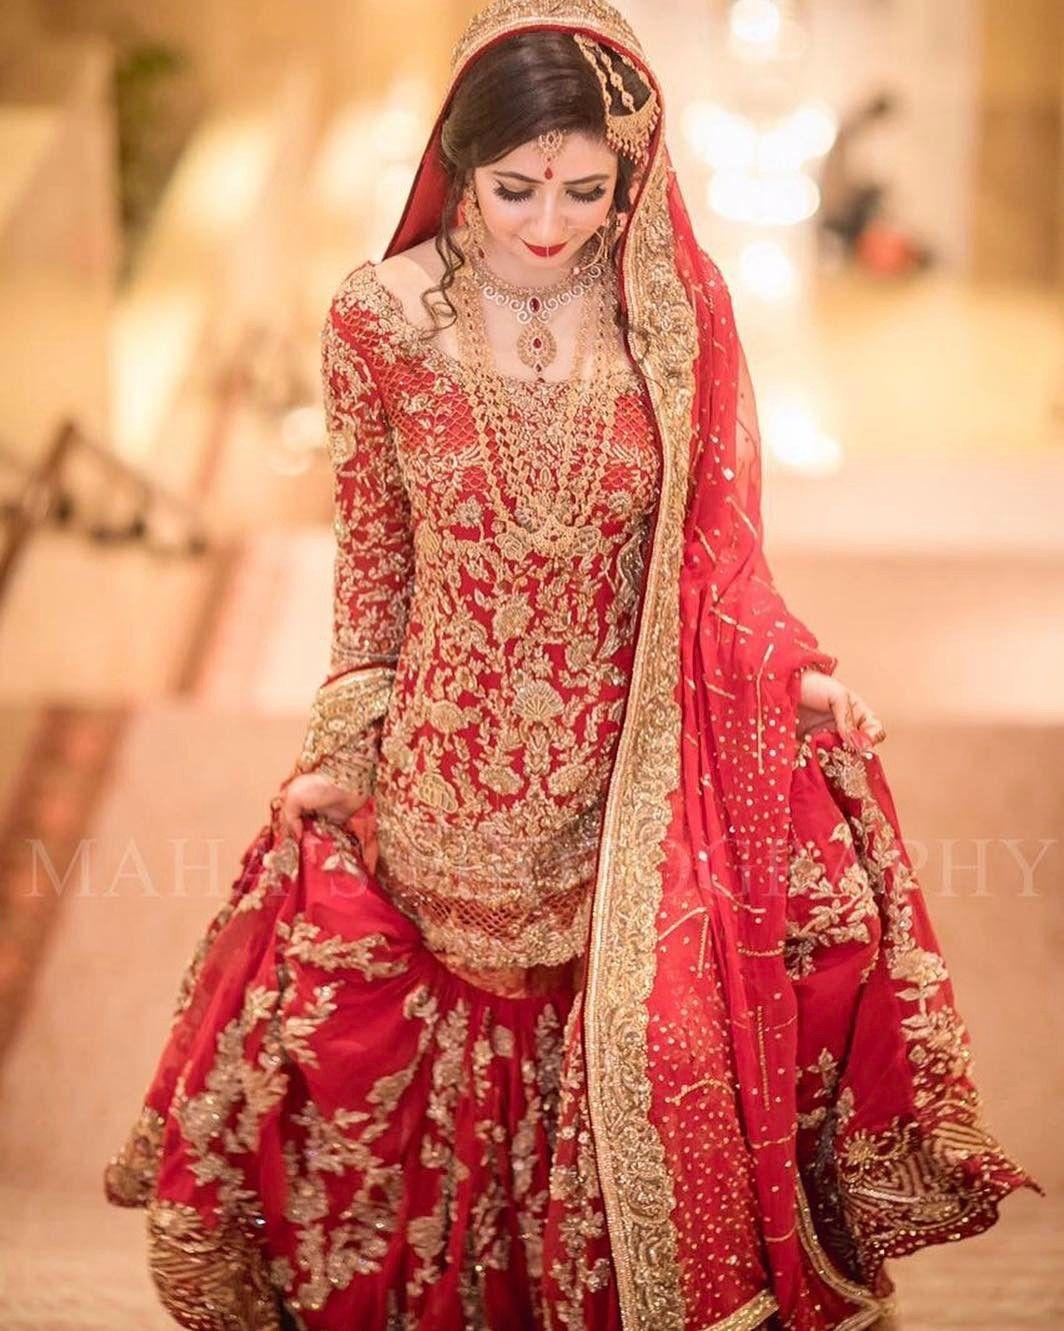 Wunderbar Red Pakistani Wedding Dresses Fotos - Brautkleider Ideen ...